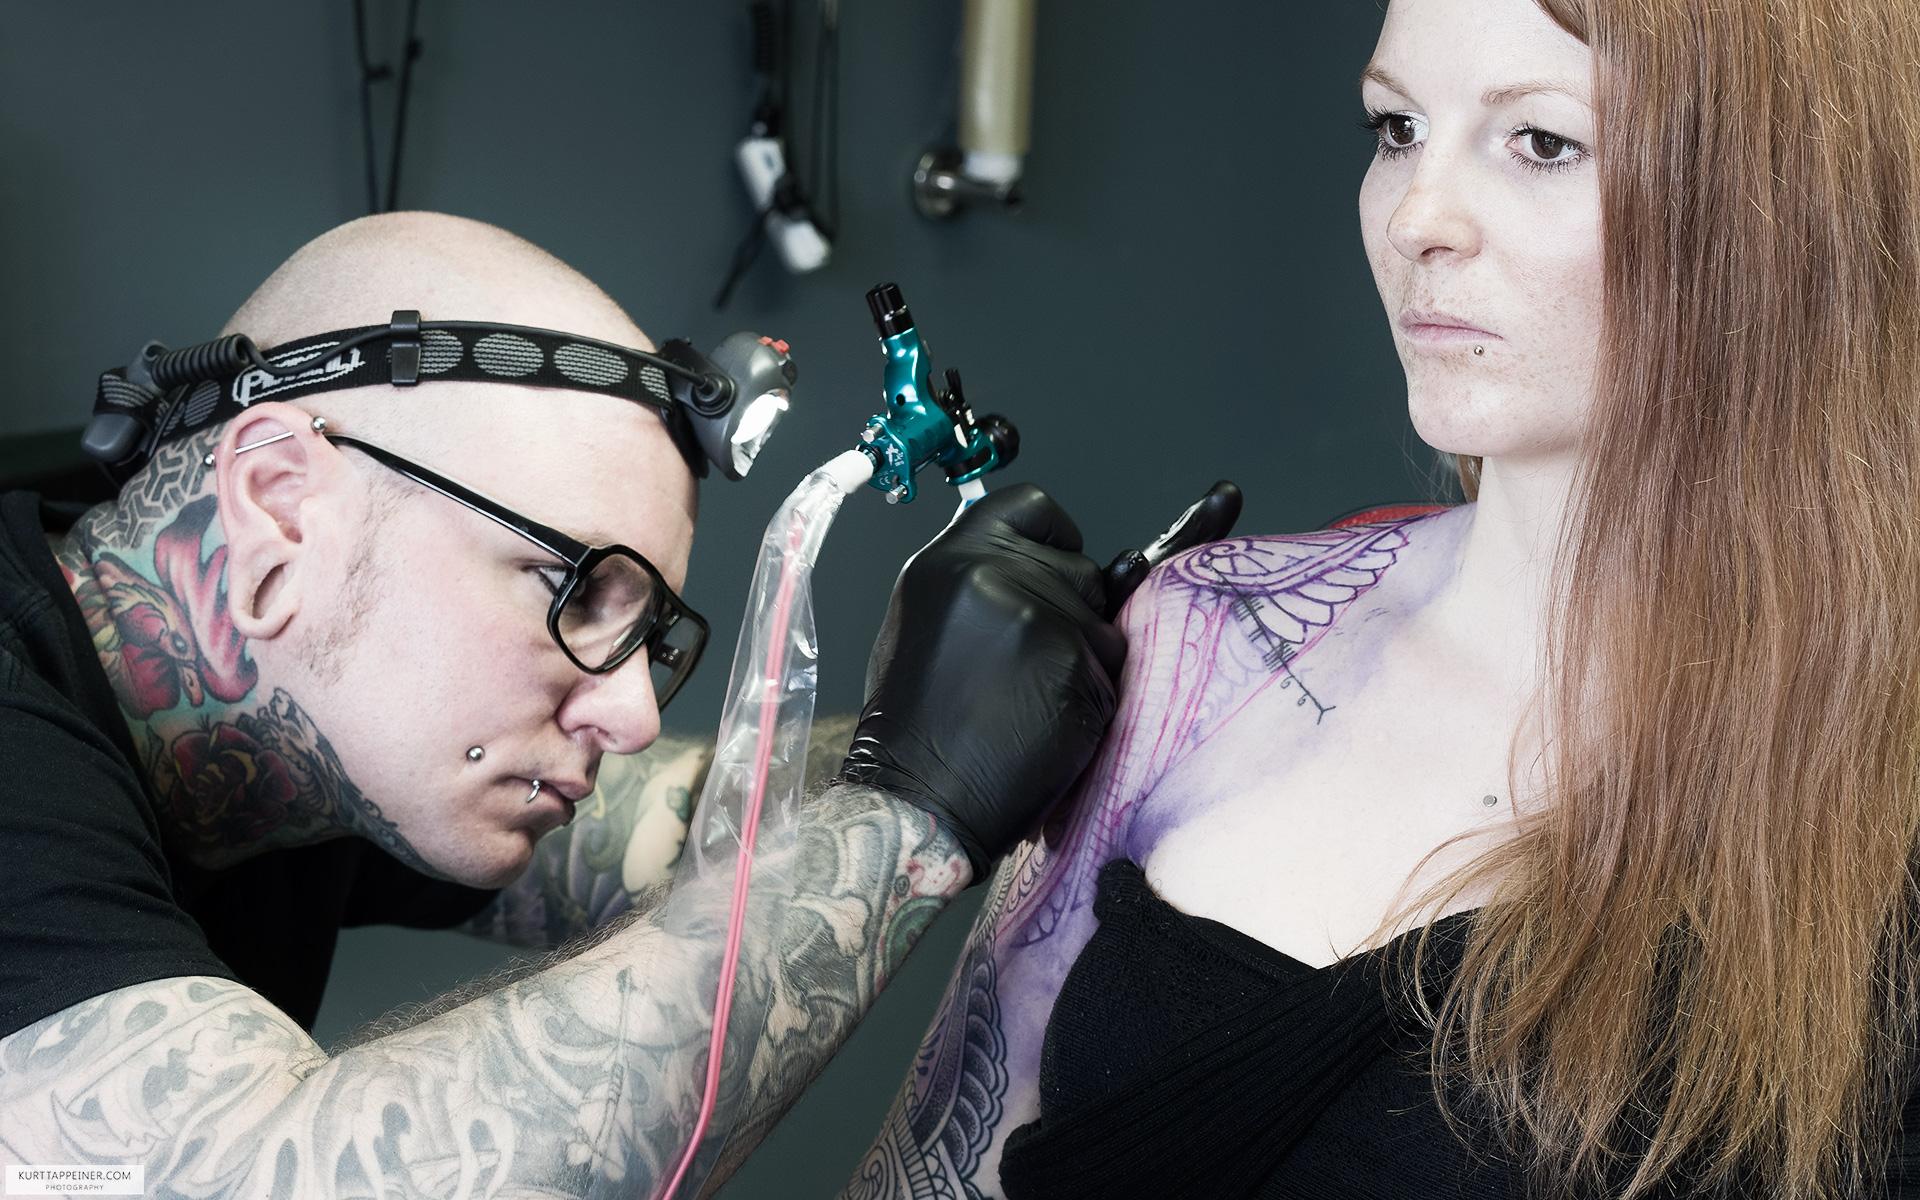 Manuel Winkler - Tattoo Artist